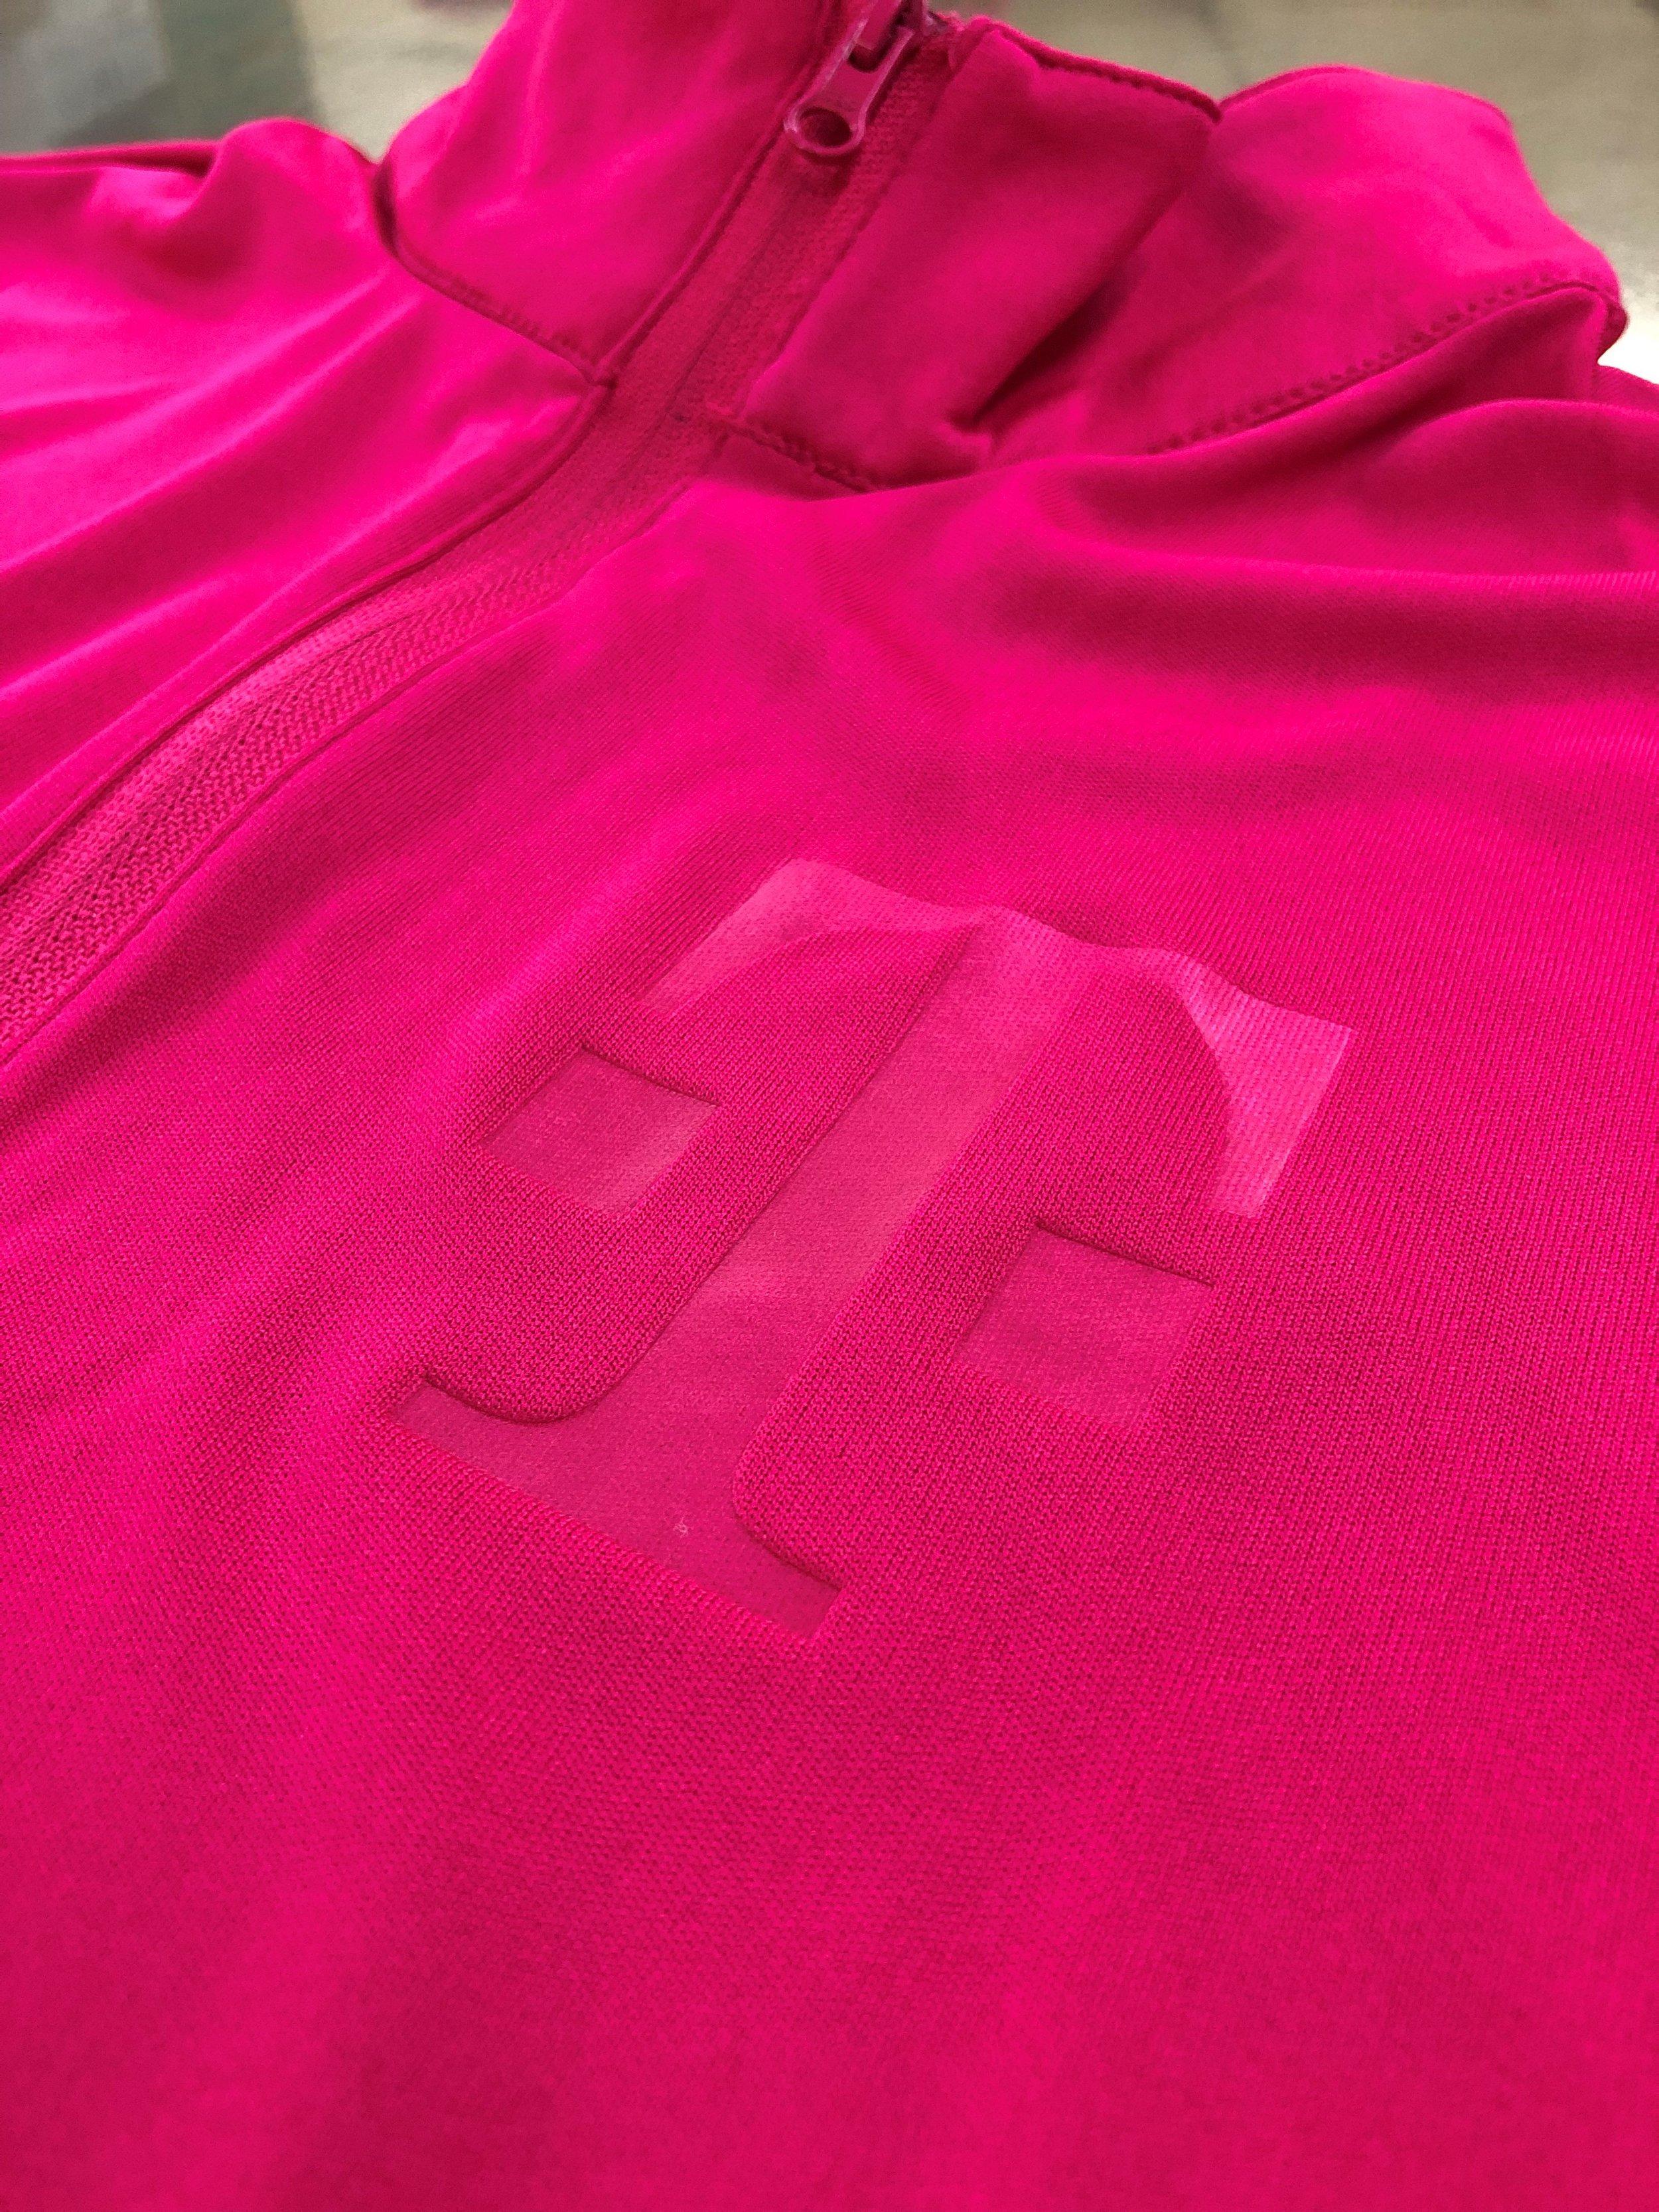 logounltd_laser_embroidery_screen_printing_apparel_uniform_custom_tshirts_kirkland_bellevue_seattle_redmond_branded_merchandise_promotional_products_logo_unltd_t_mobile_Tuesday_tmobile_un_carrier_magenta_5G_john_lege (26).jpg